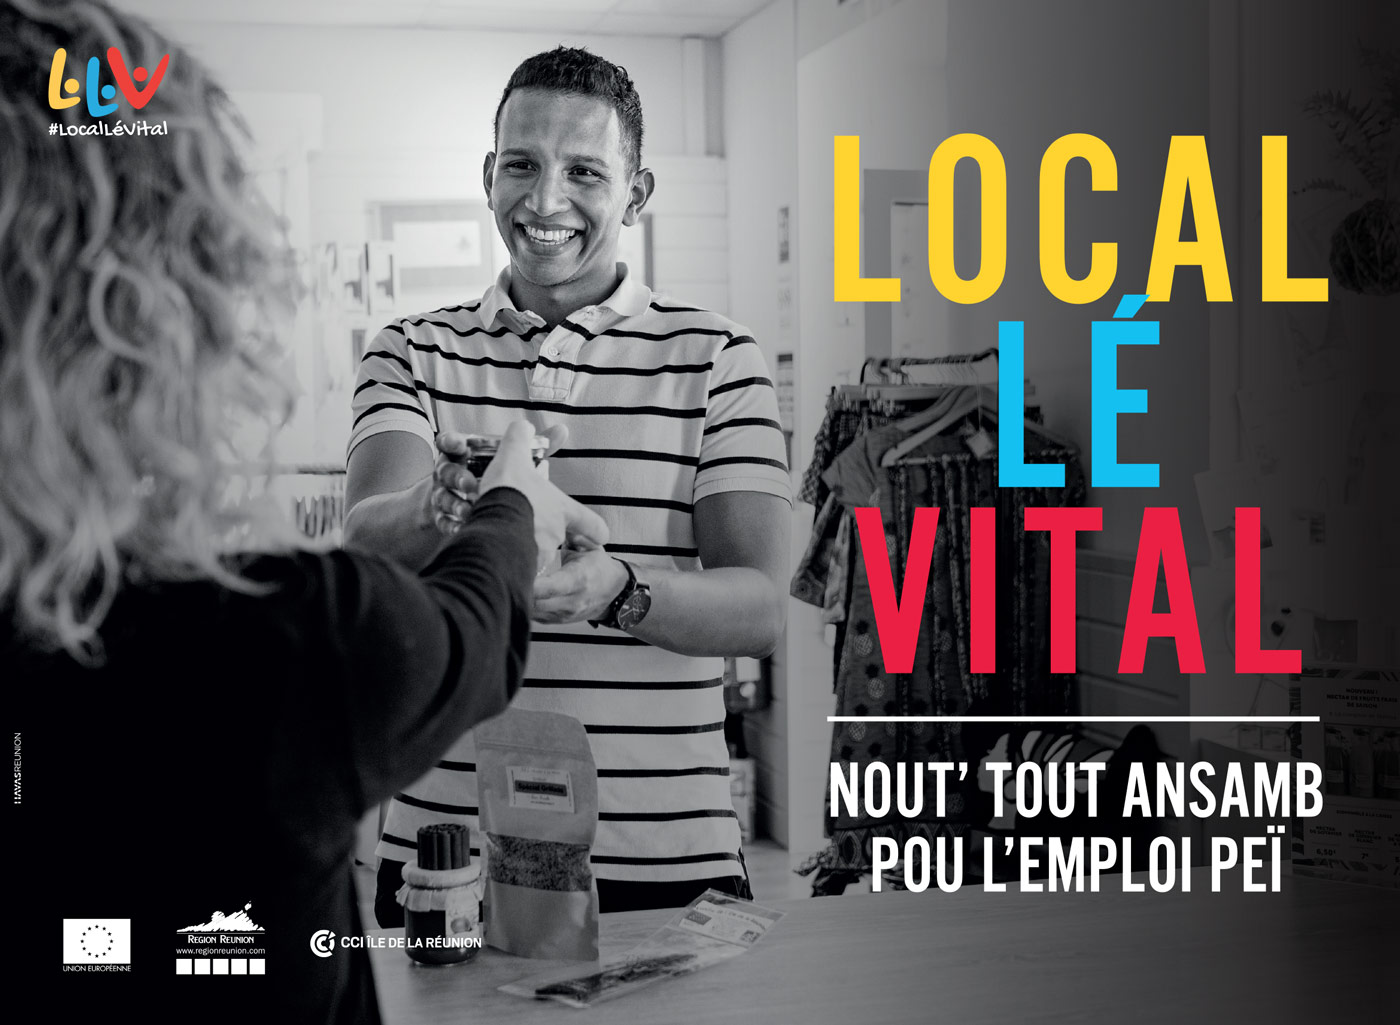 Local Lé Vital, Nout' Tout' Ansamb pou l'Emploi Péï